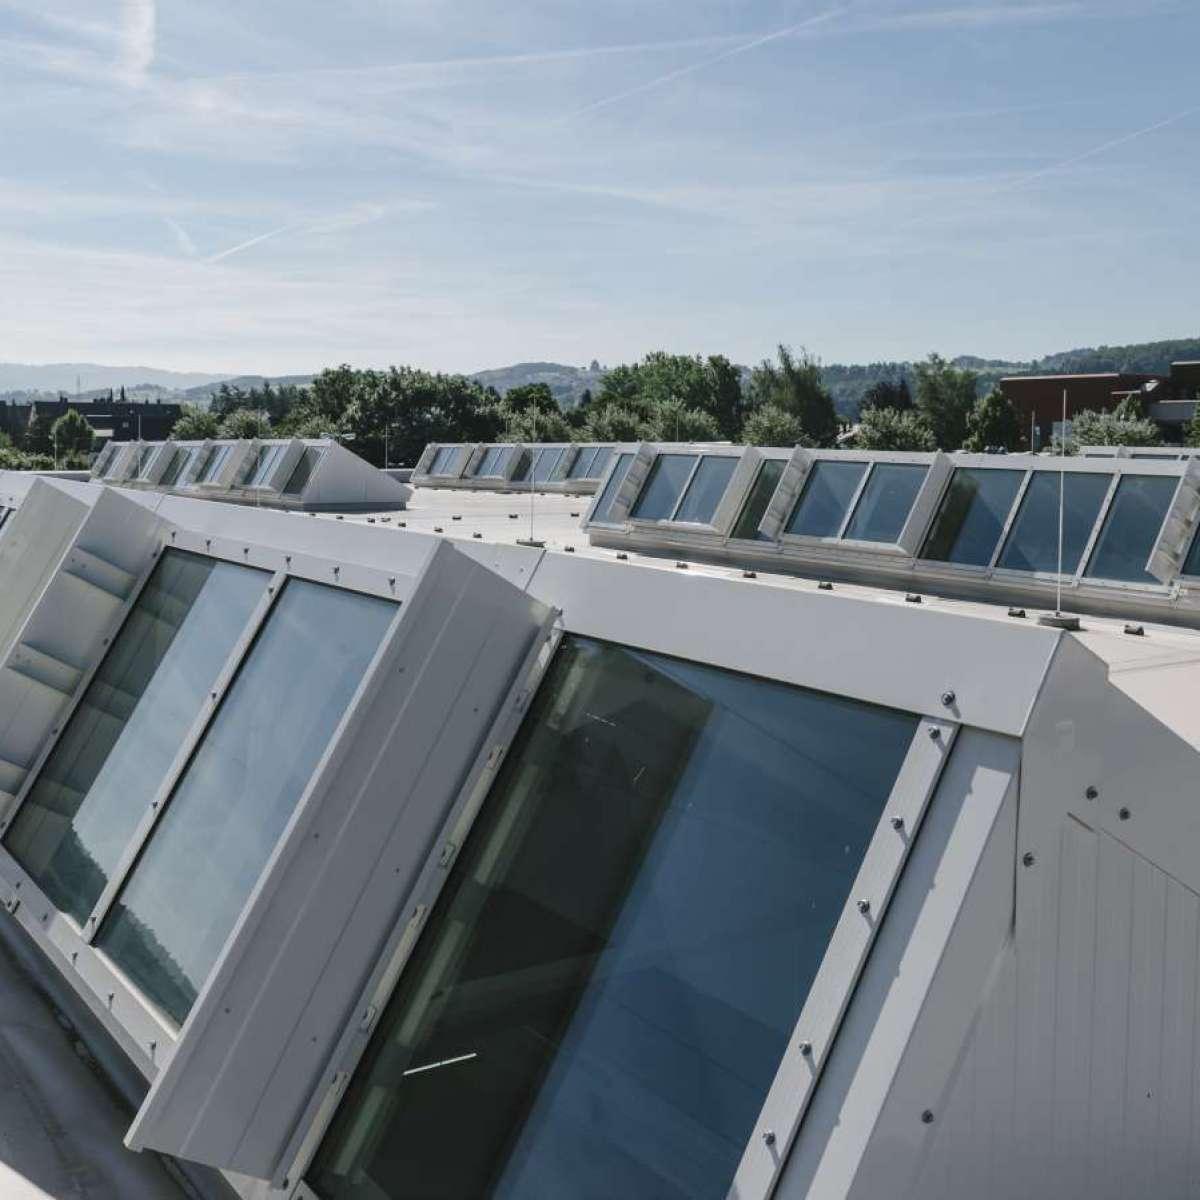 Endress+Hauser GmbH+Co. KG | Maulburg • Shedline glass rooflight, 6 units - each 14 m x 2 m, 24NSHEV flaps